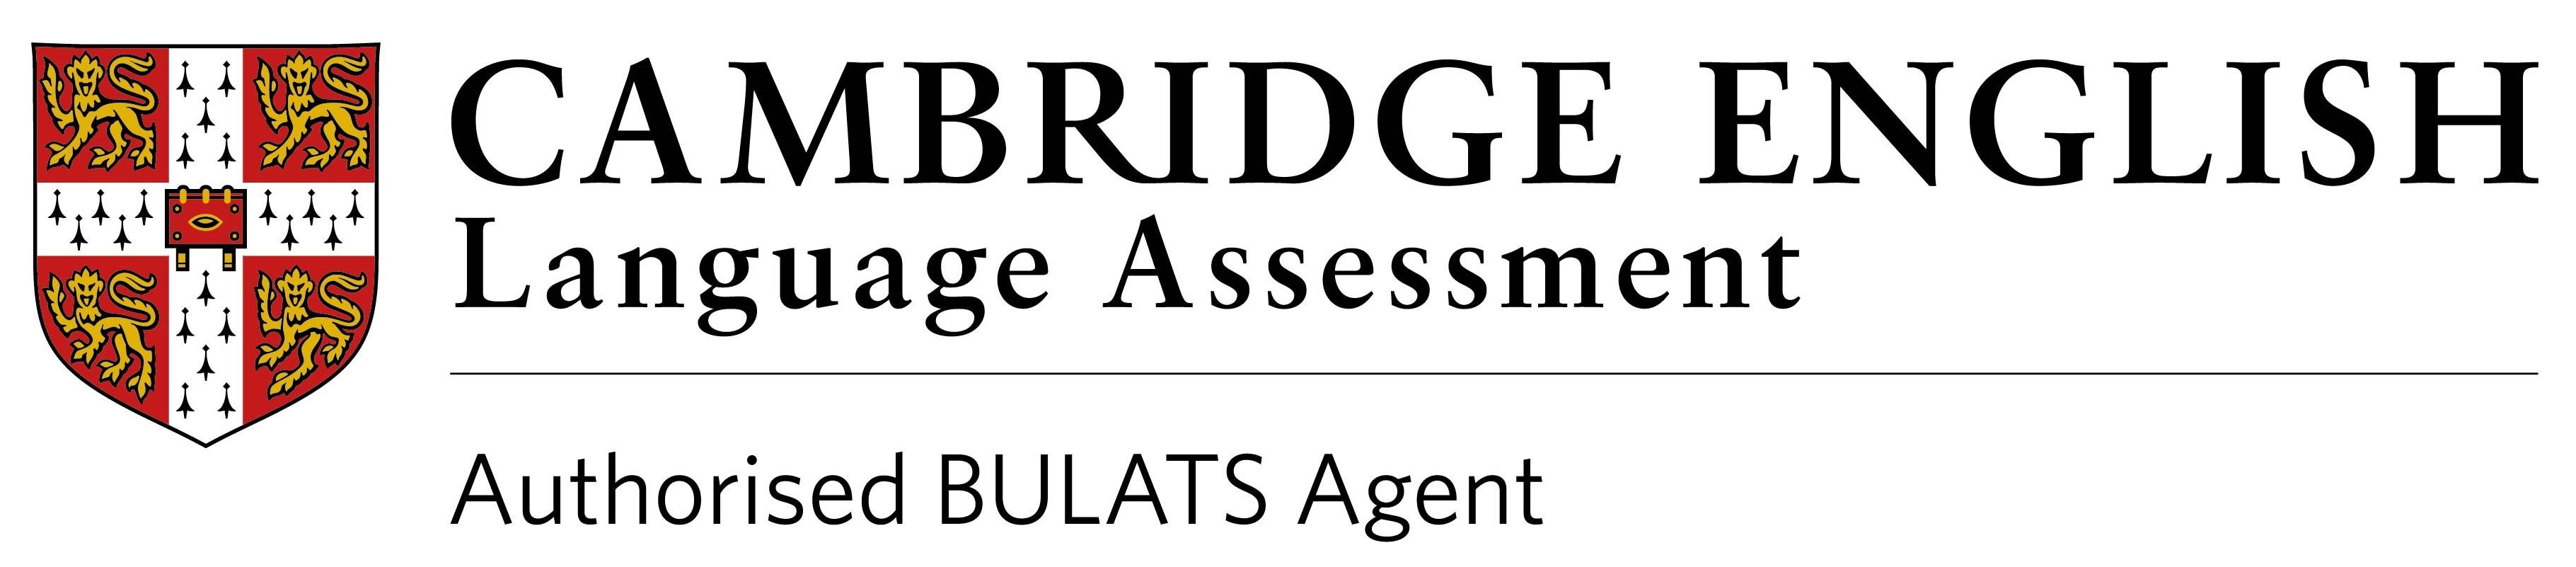 E2Language Authorized BULATS Agent